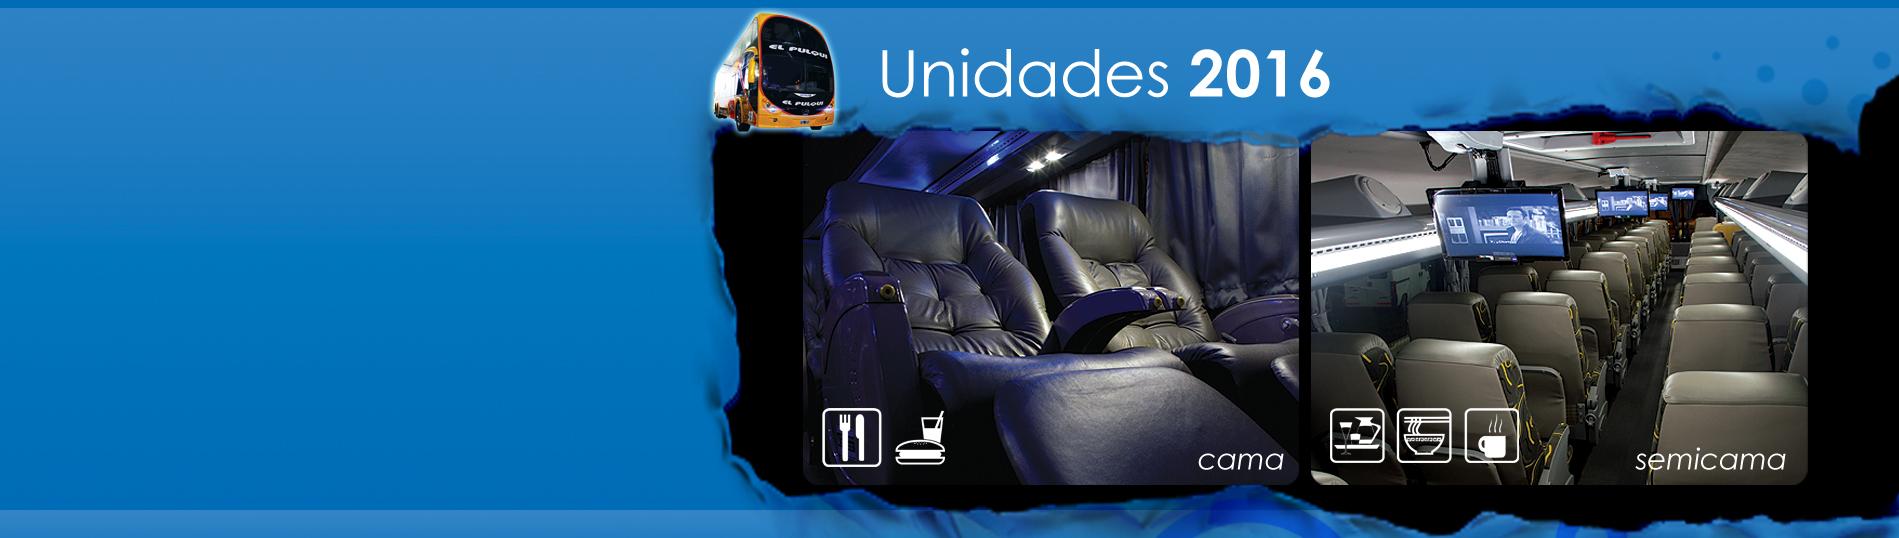 UNIDADES-2016-4